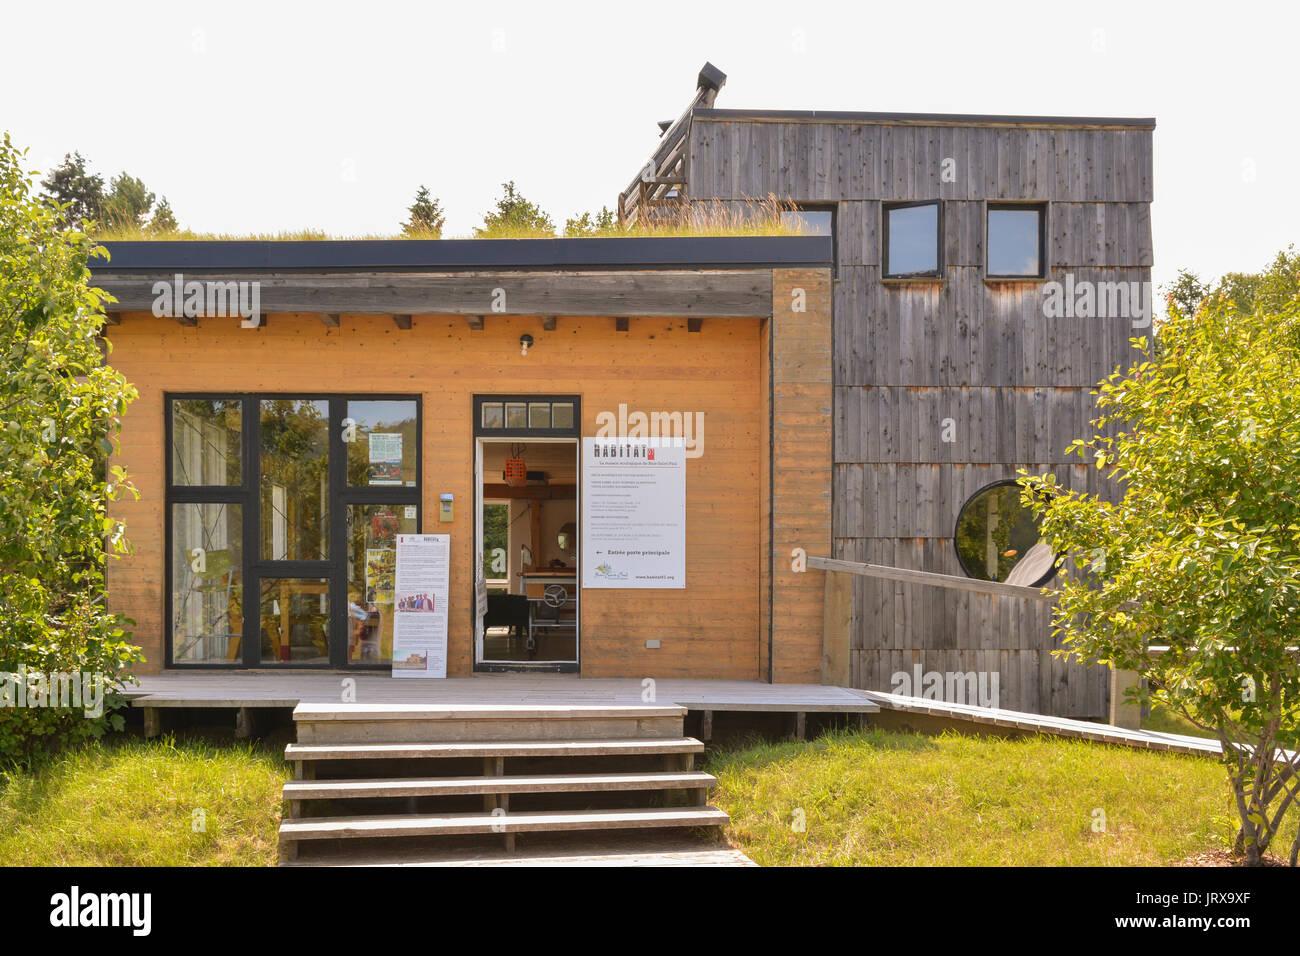 Habitat 07 eco-friendly sustainable building, Bale-St-Paul, Quebec, Canada - Stock Image